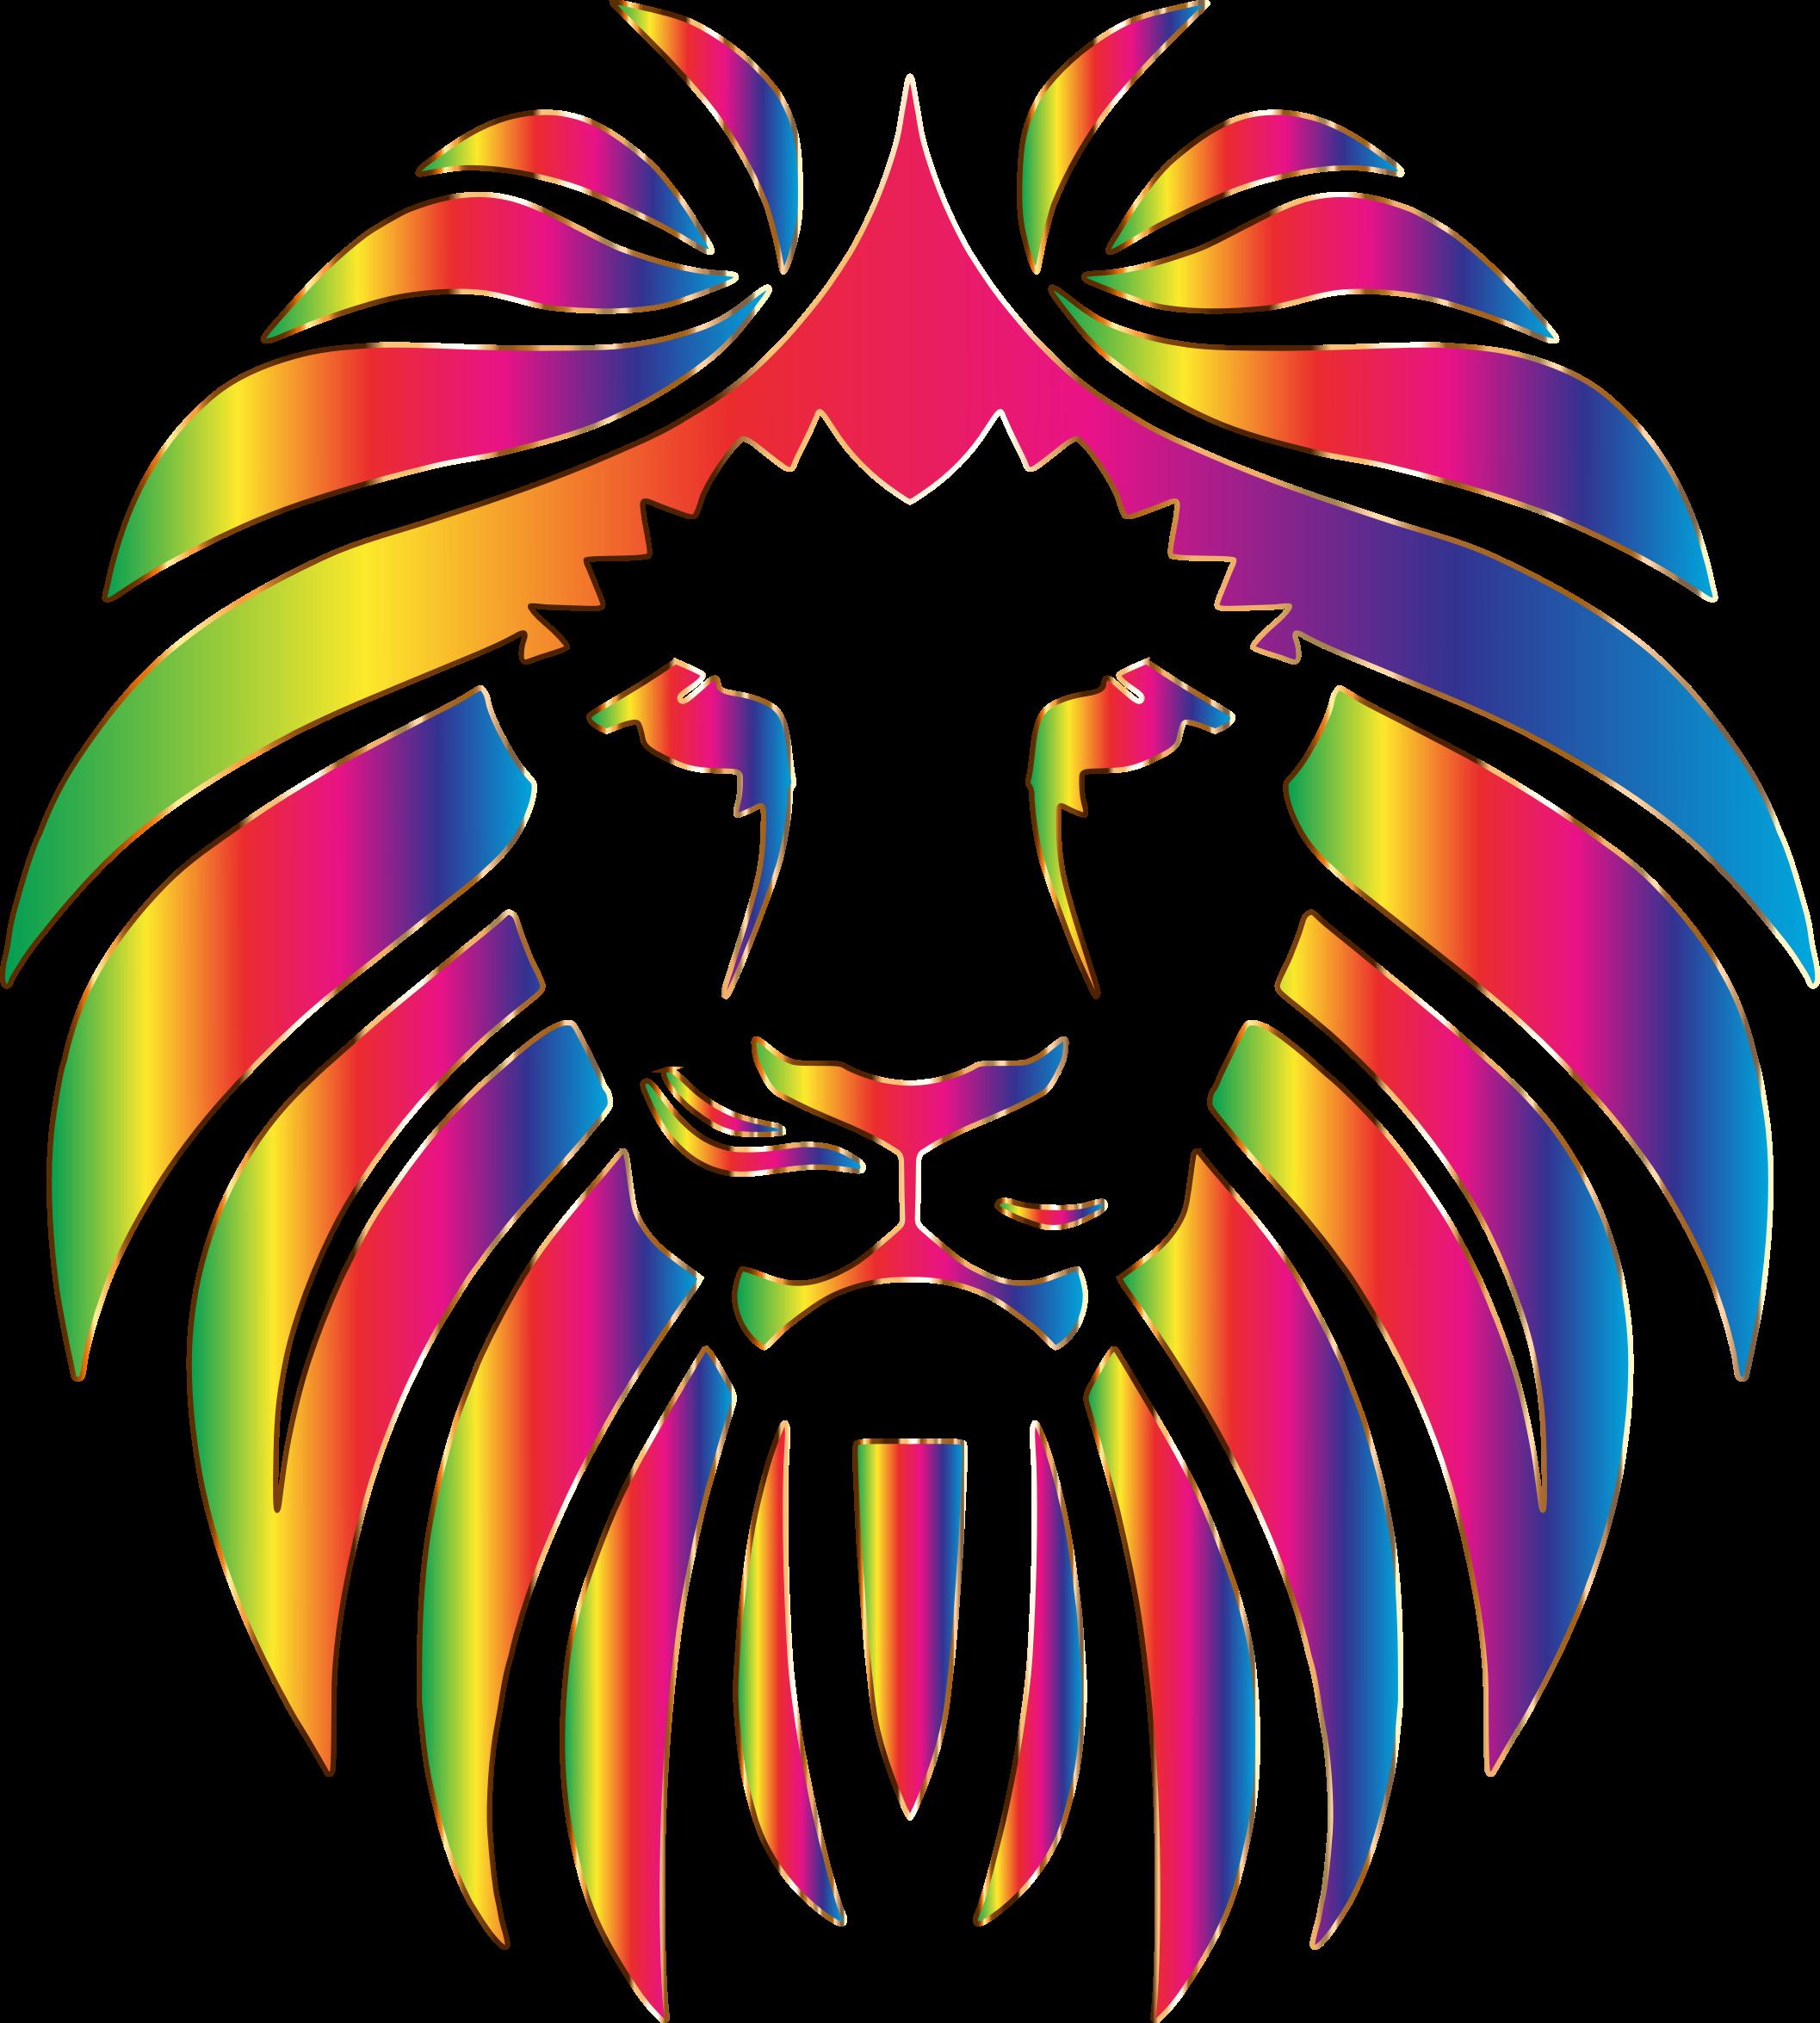 Lion frames illustrations hd. Clipart park rainbow